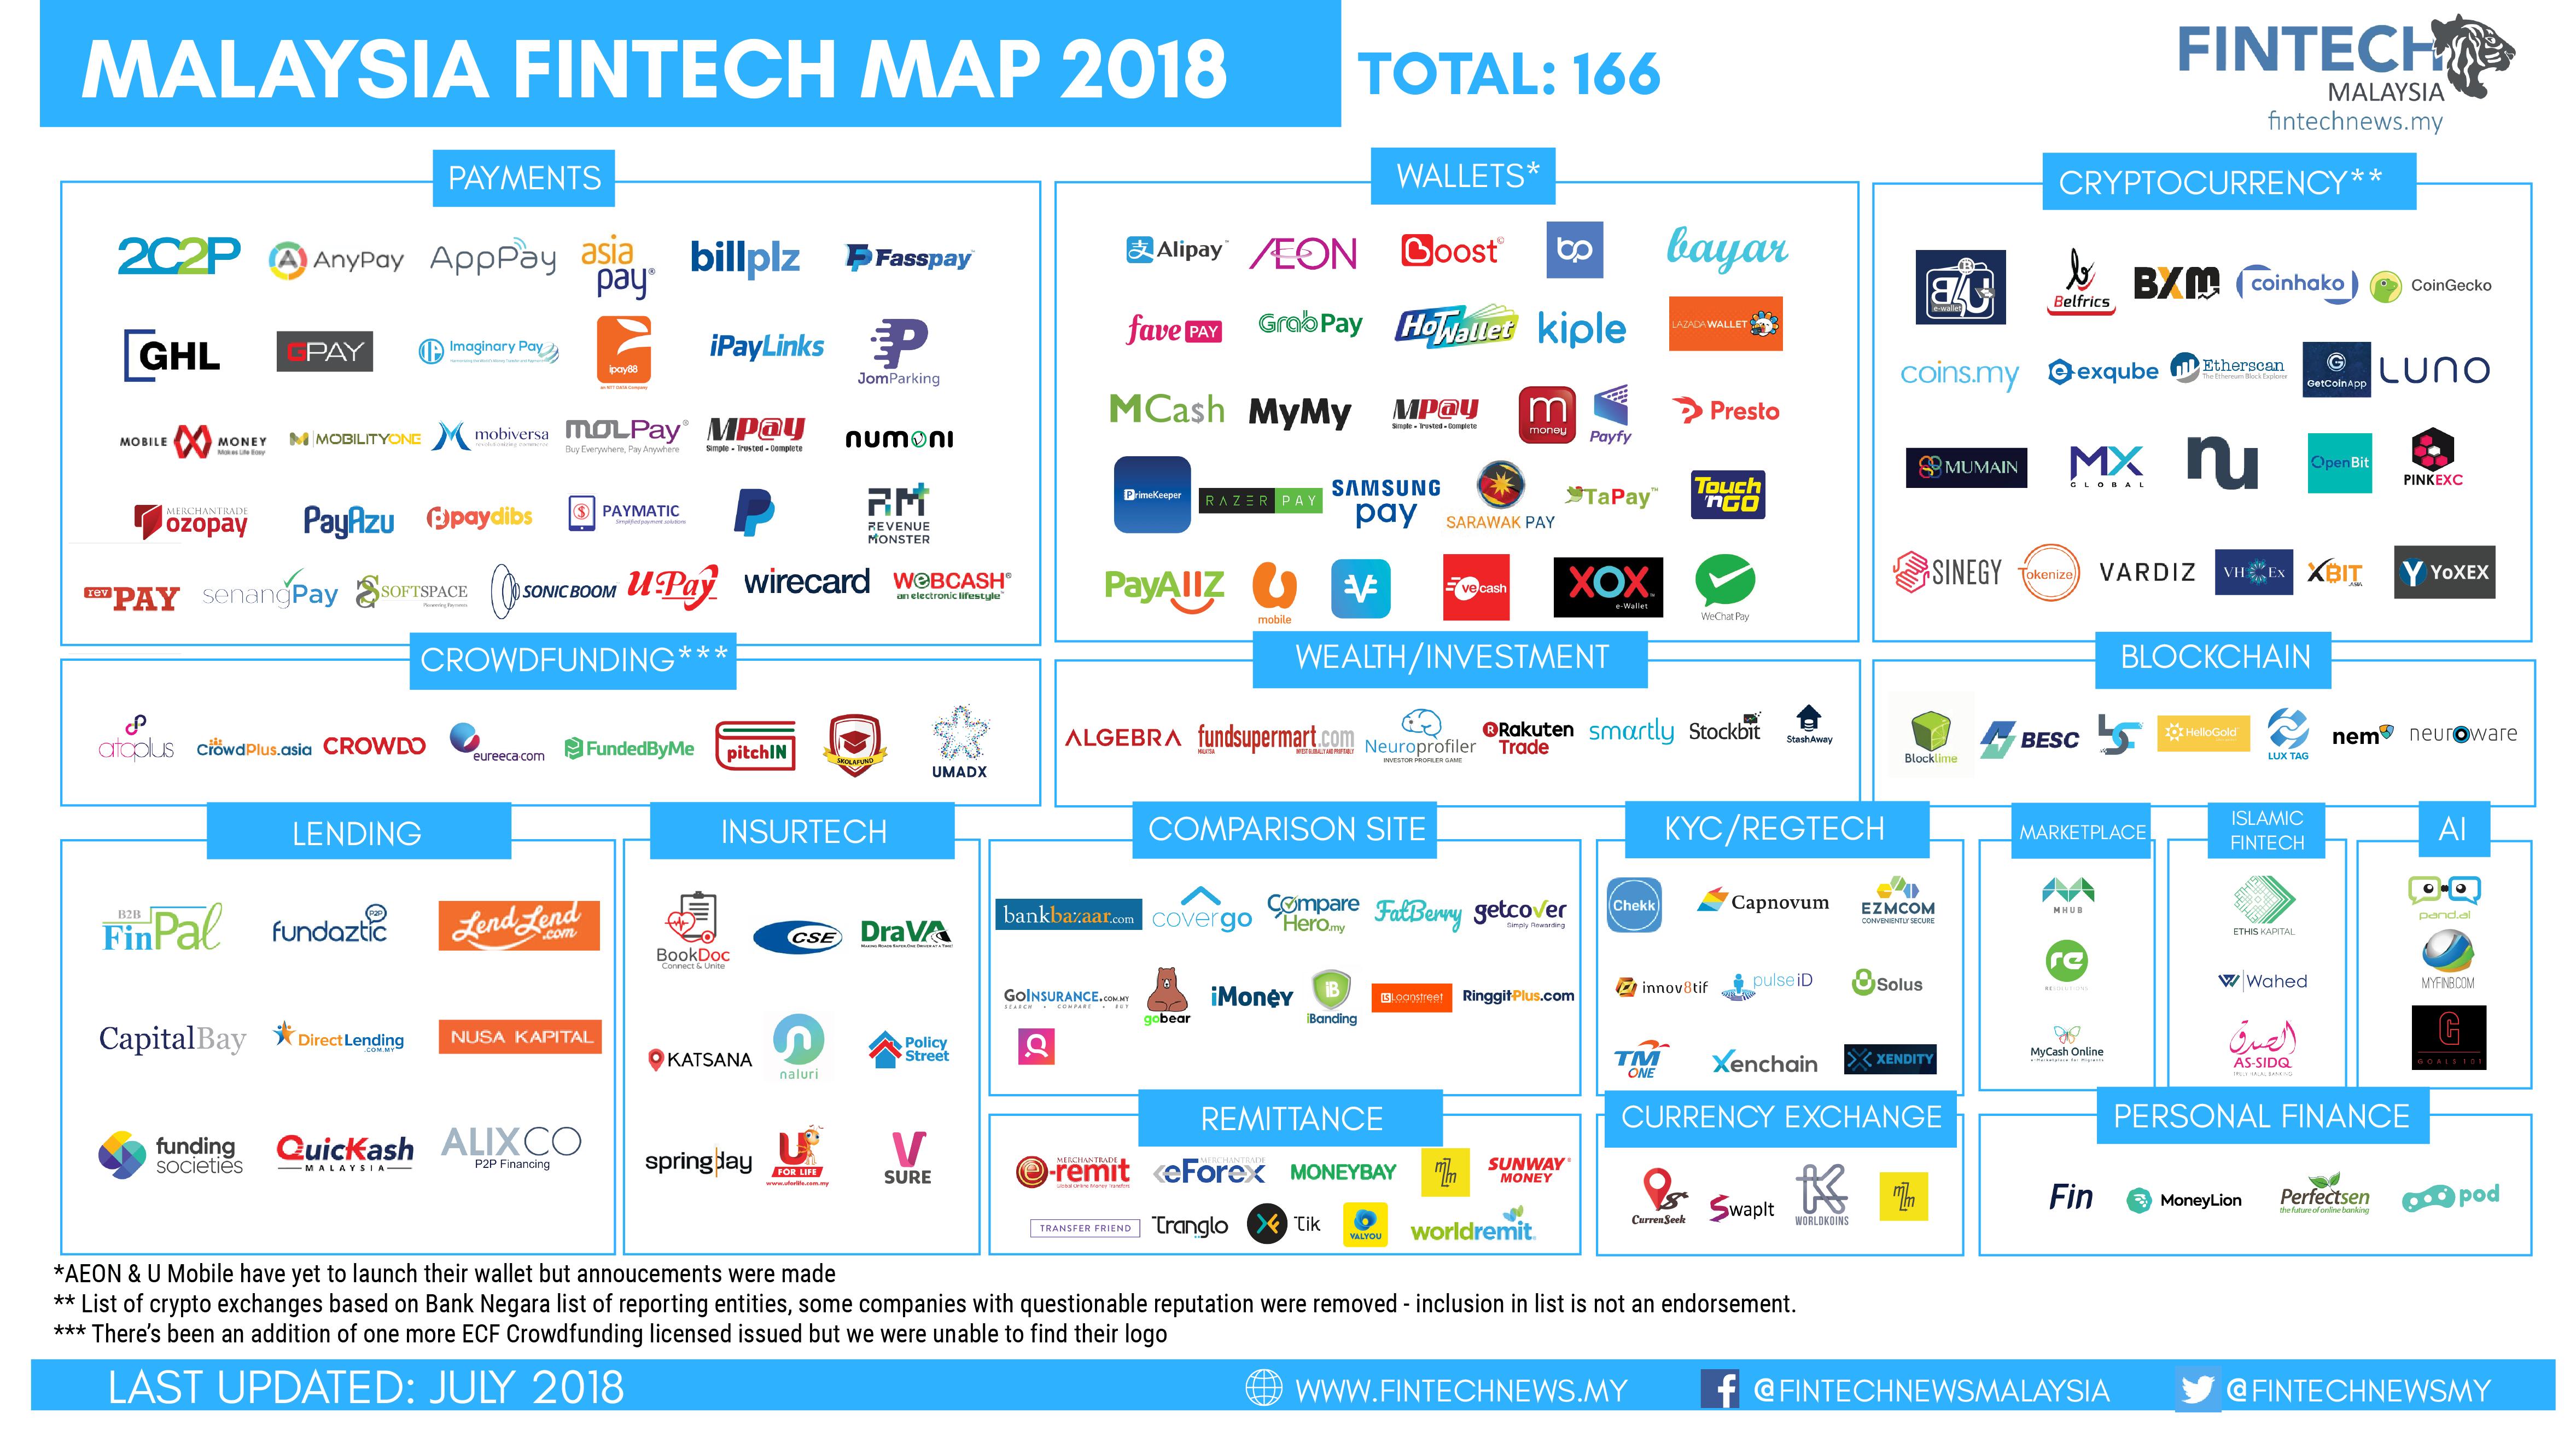 Fintech Malaysia Map 2018 Fintech Malaysia Report 2018 Fintech News Malaysia